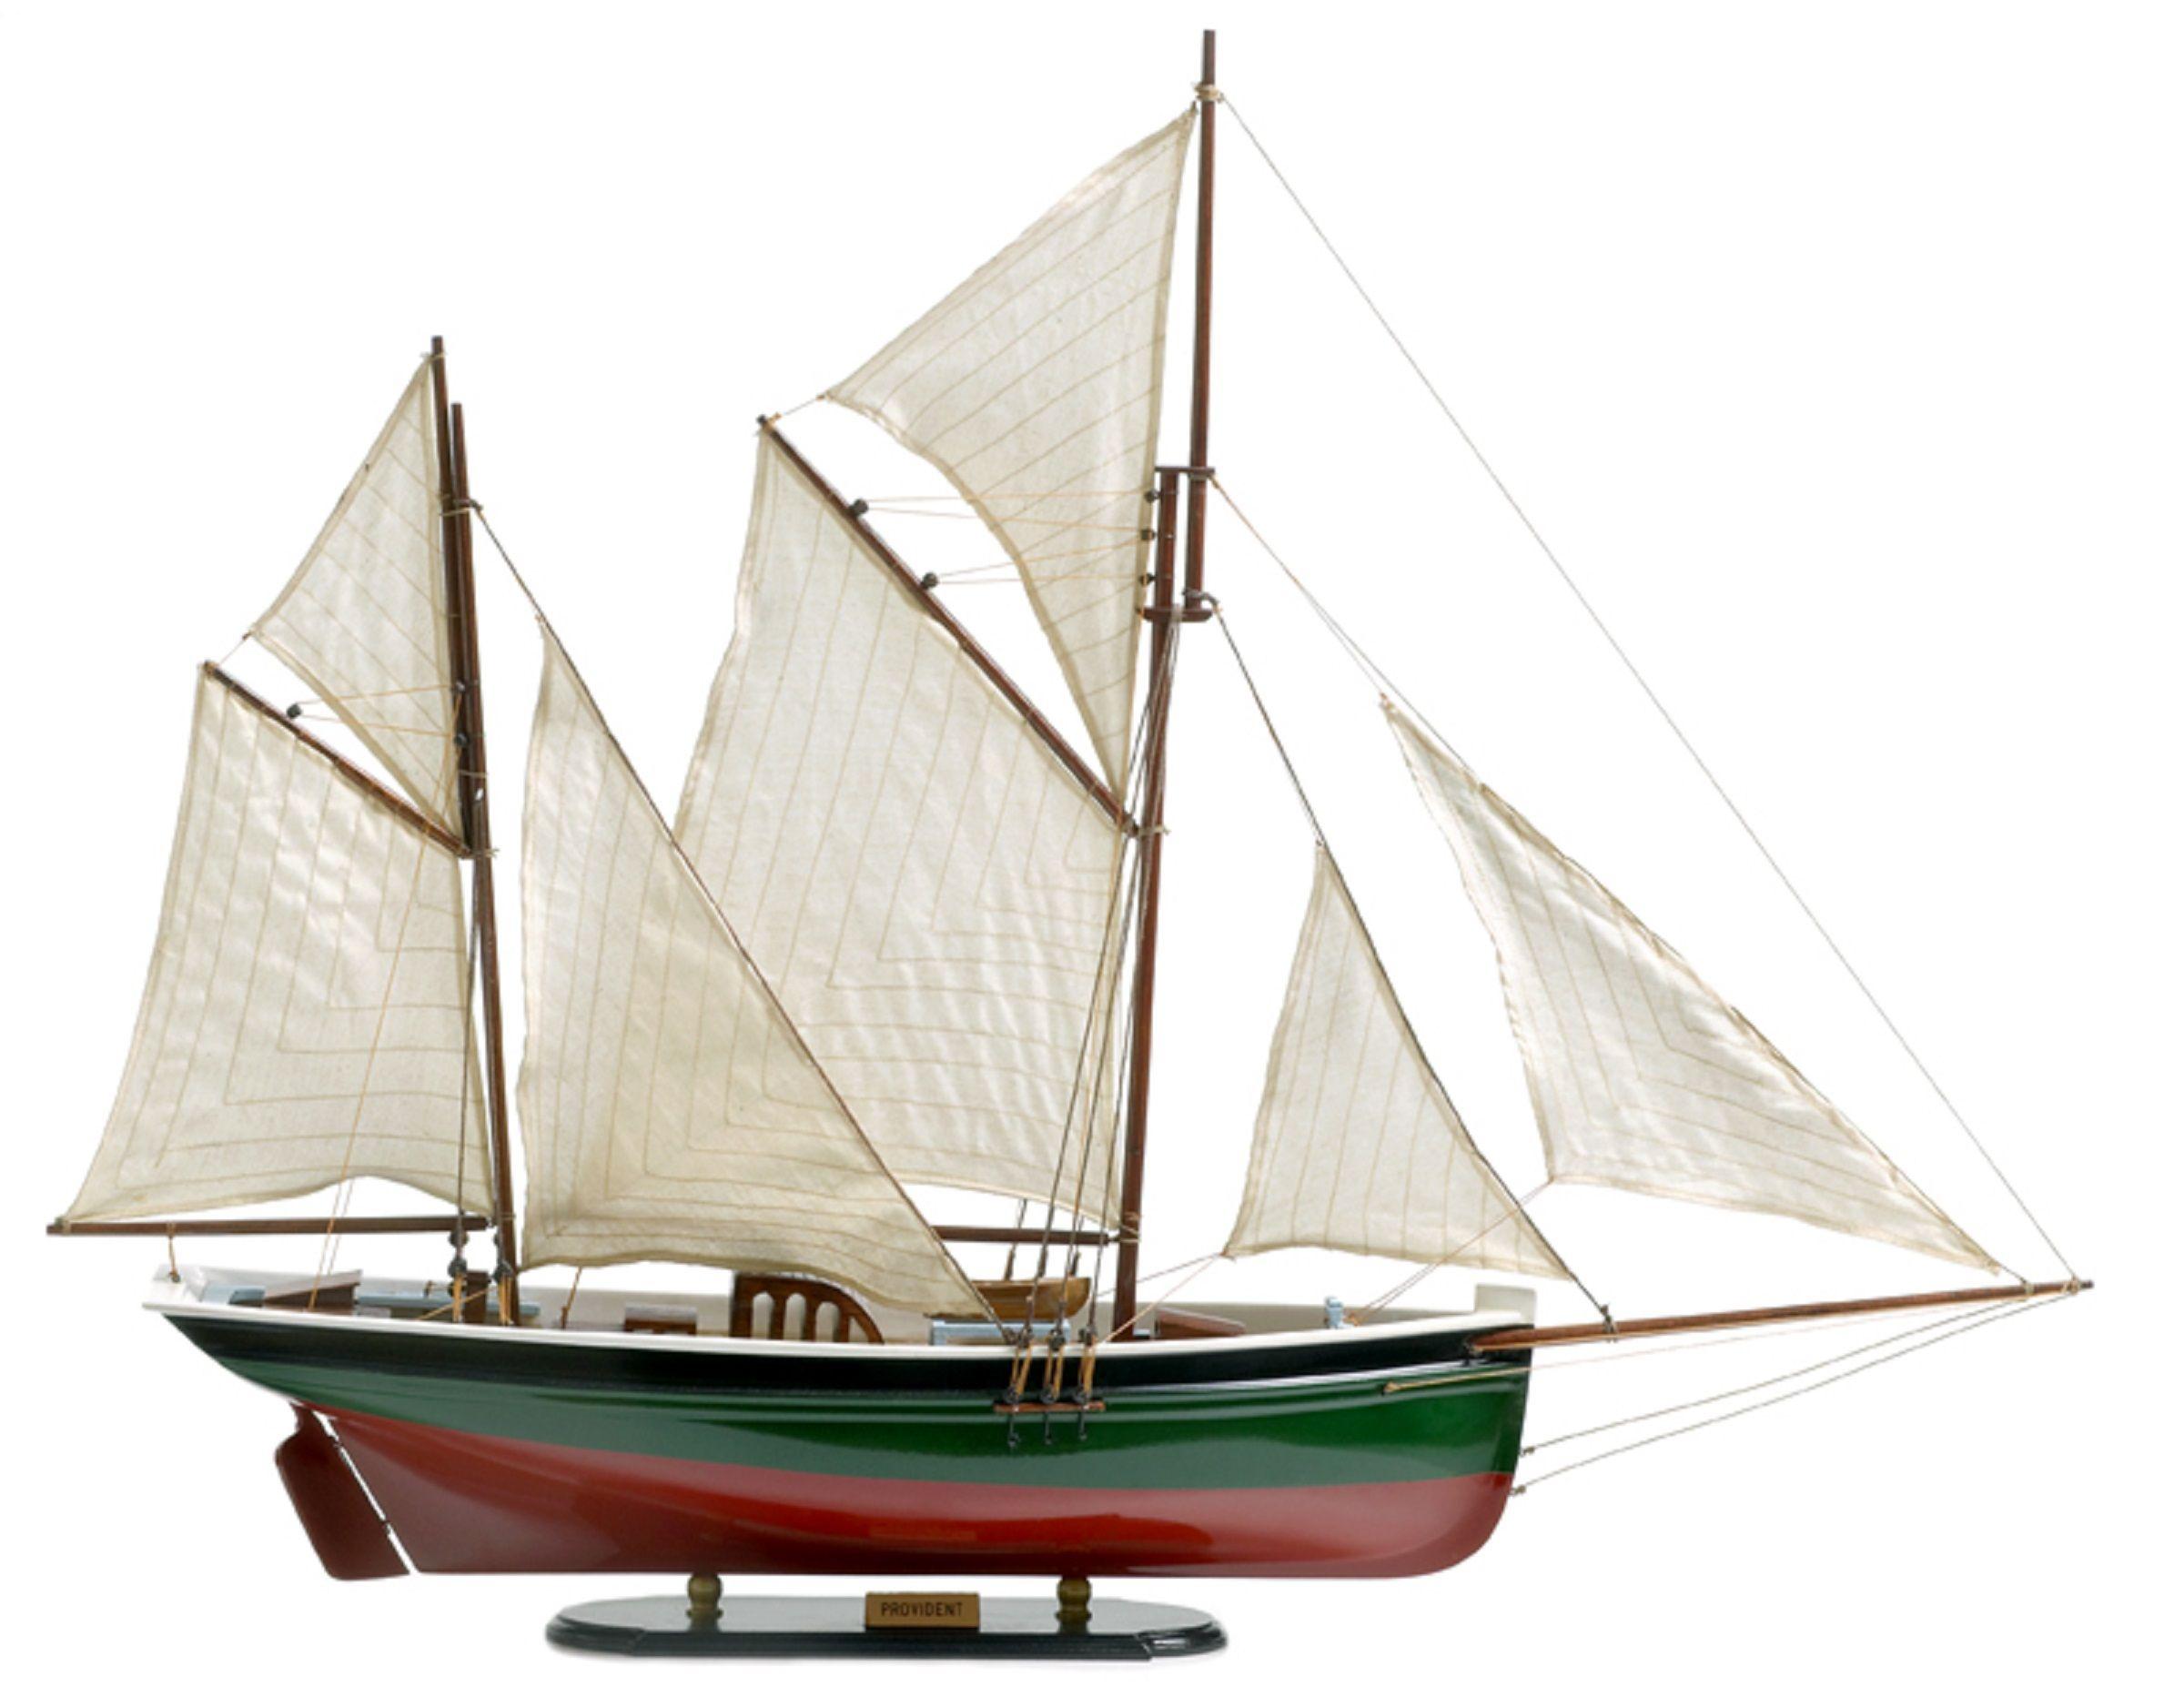 134-8553-Provident-Ship-Model-Superior-Range